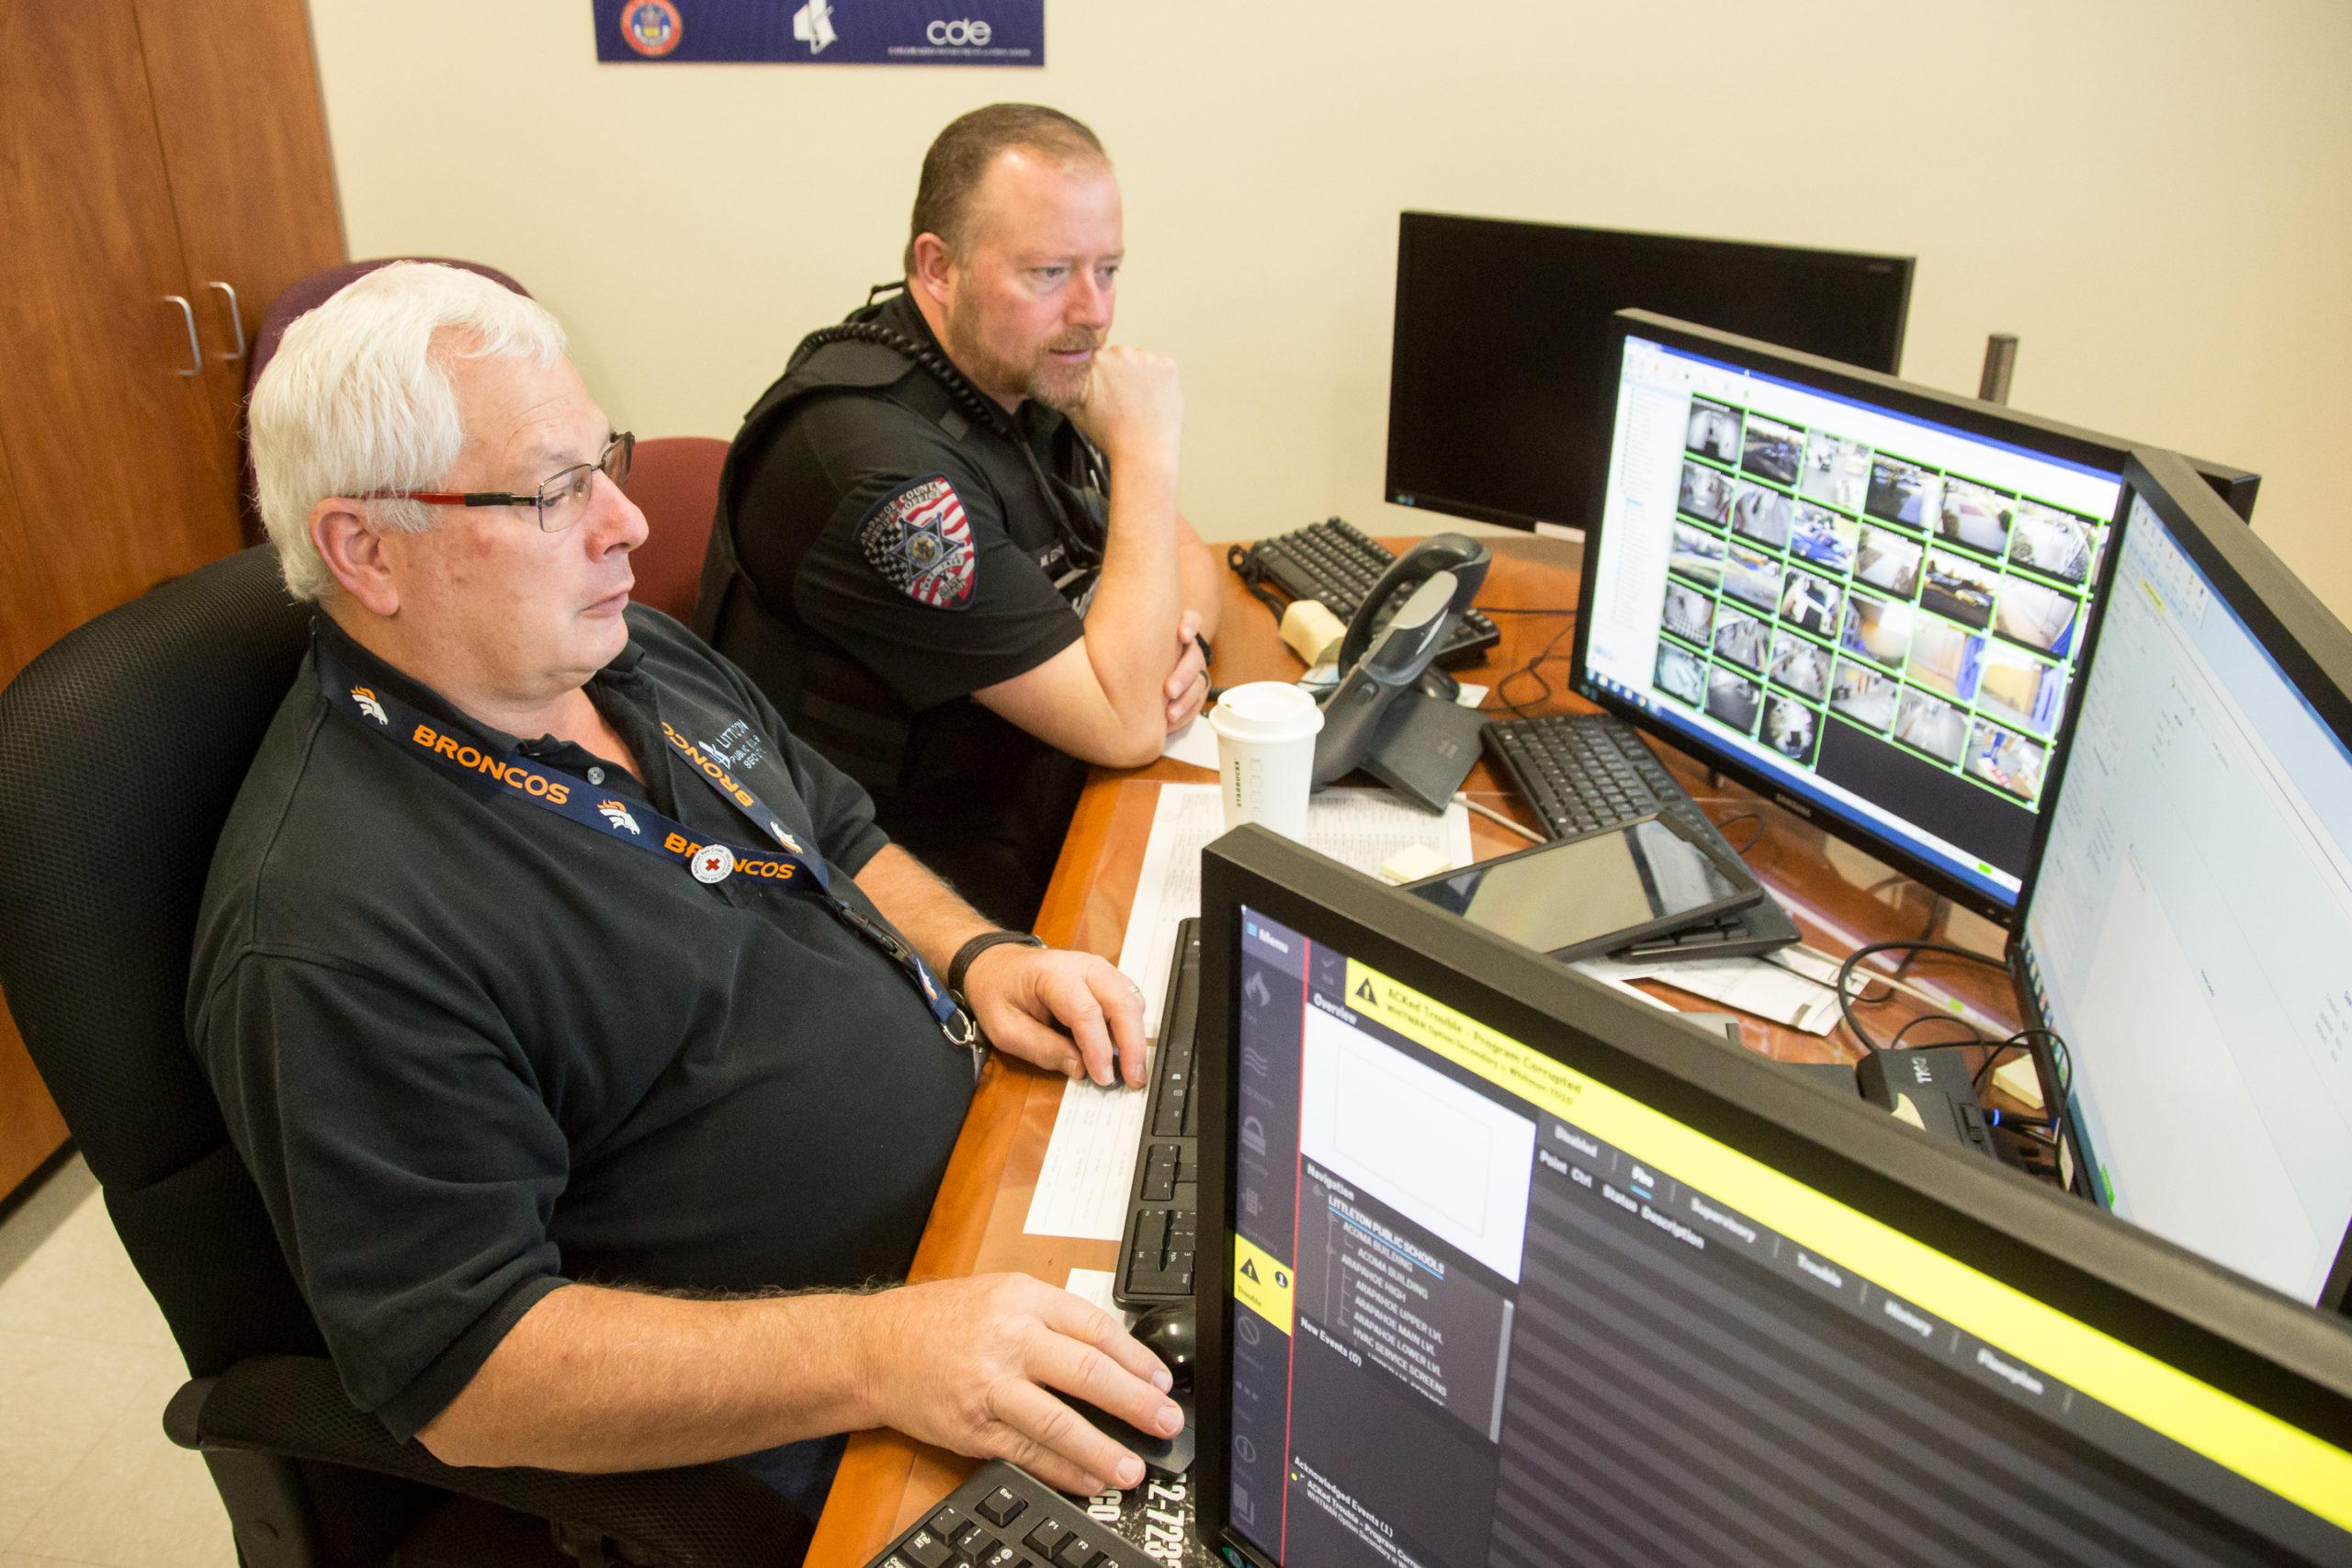 Littleton Public Schools Unified Security Technology Program